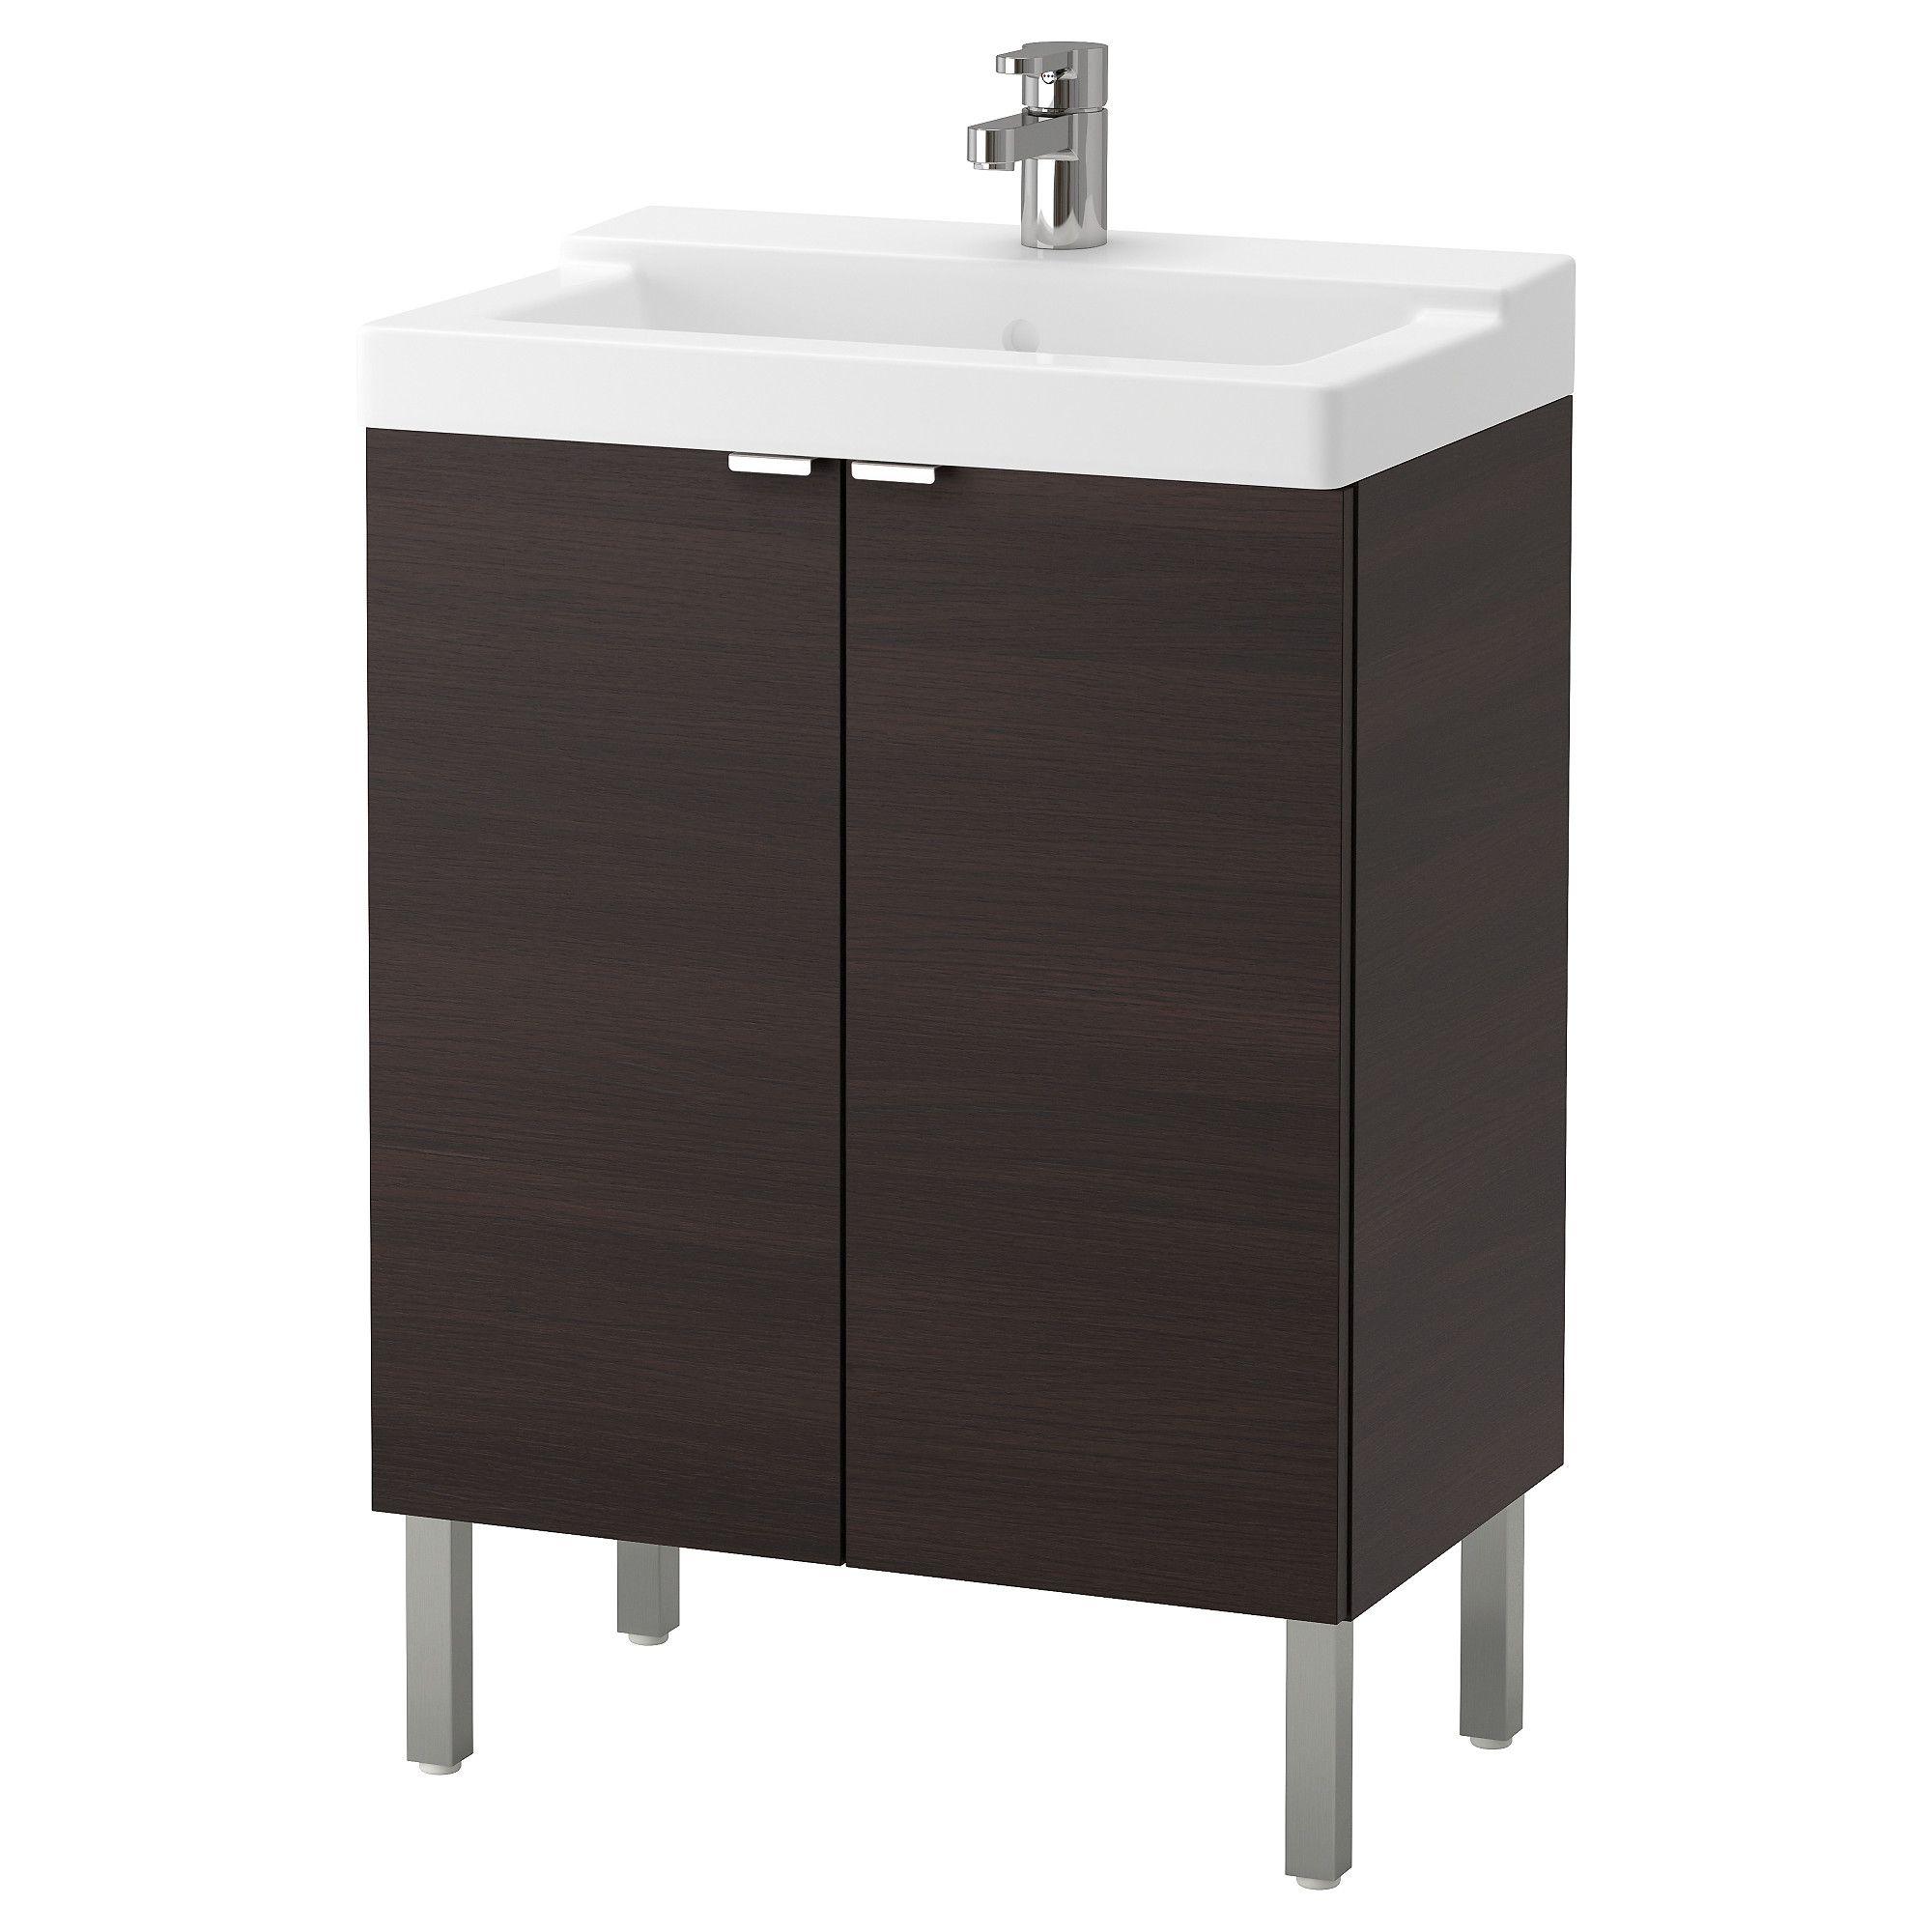 Furniture Home Furnishings Find Your Inspiration Ikea Bathroom Bathroom Furniture Modern Bathroom Design